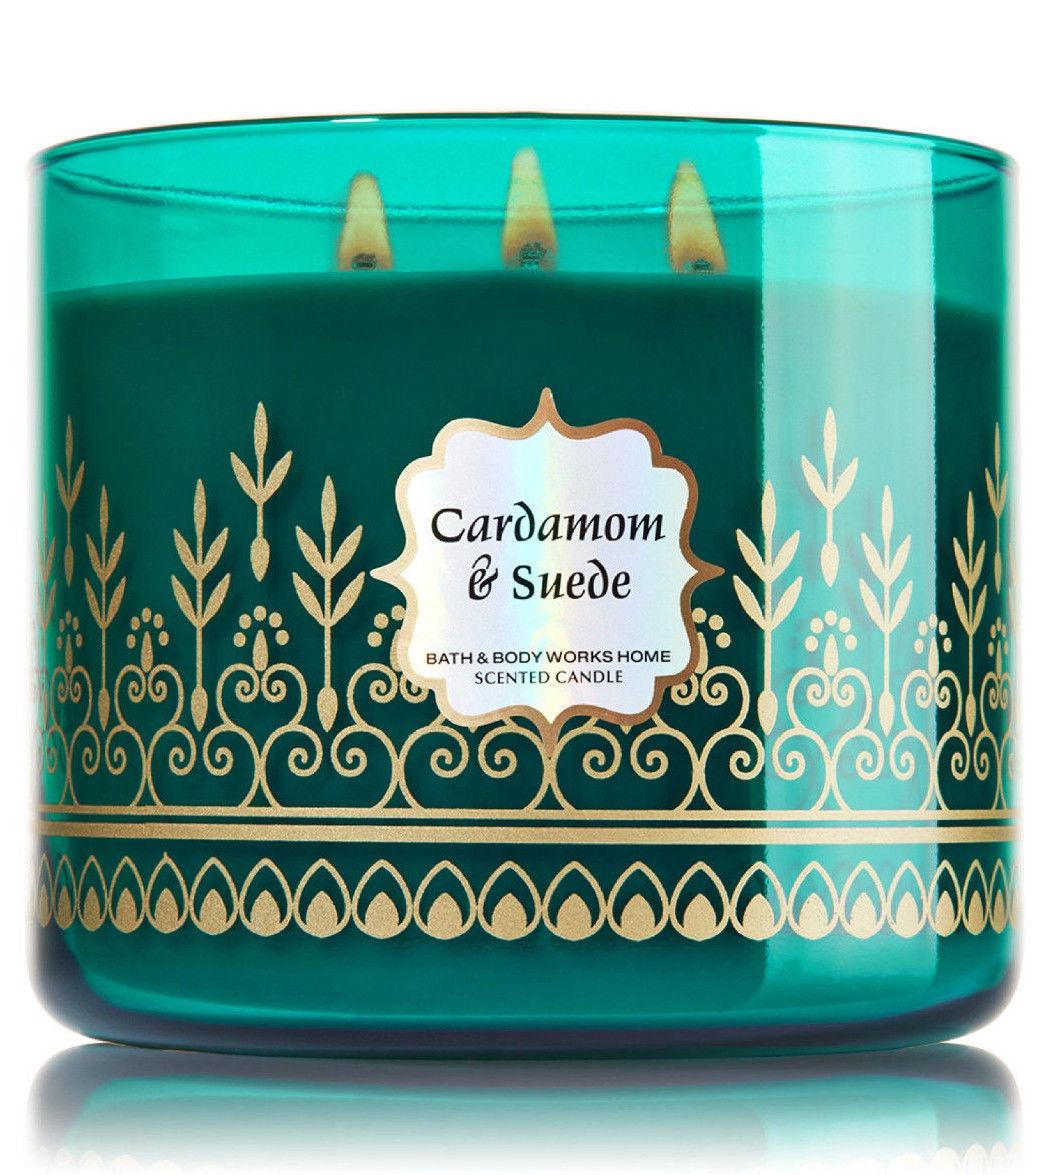 Bath & Body Works CARDAMOM & SUEDE Scented Candle, 14.5 oz/ 411 g